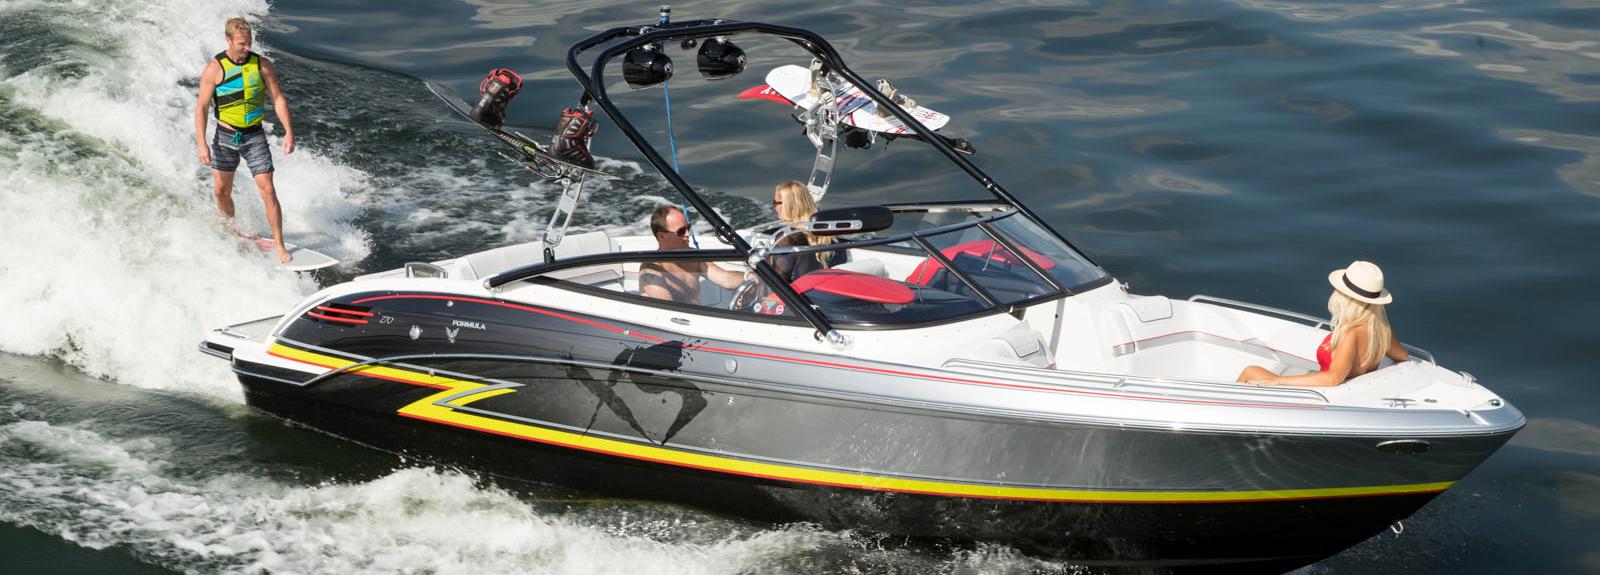 su kayağı wkaesurf wakeboard teknes Formula XS 270